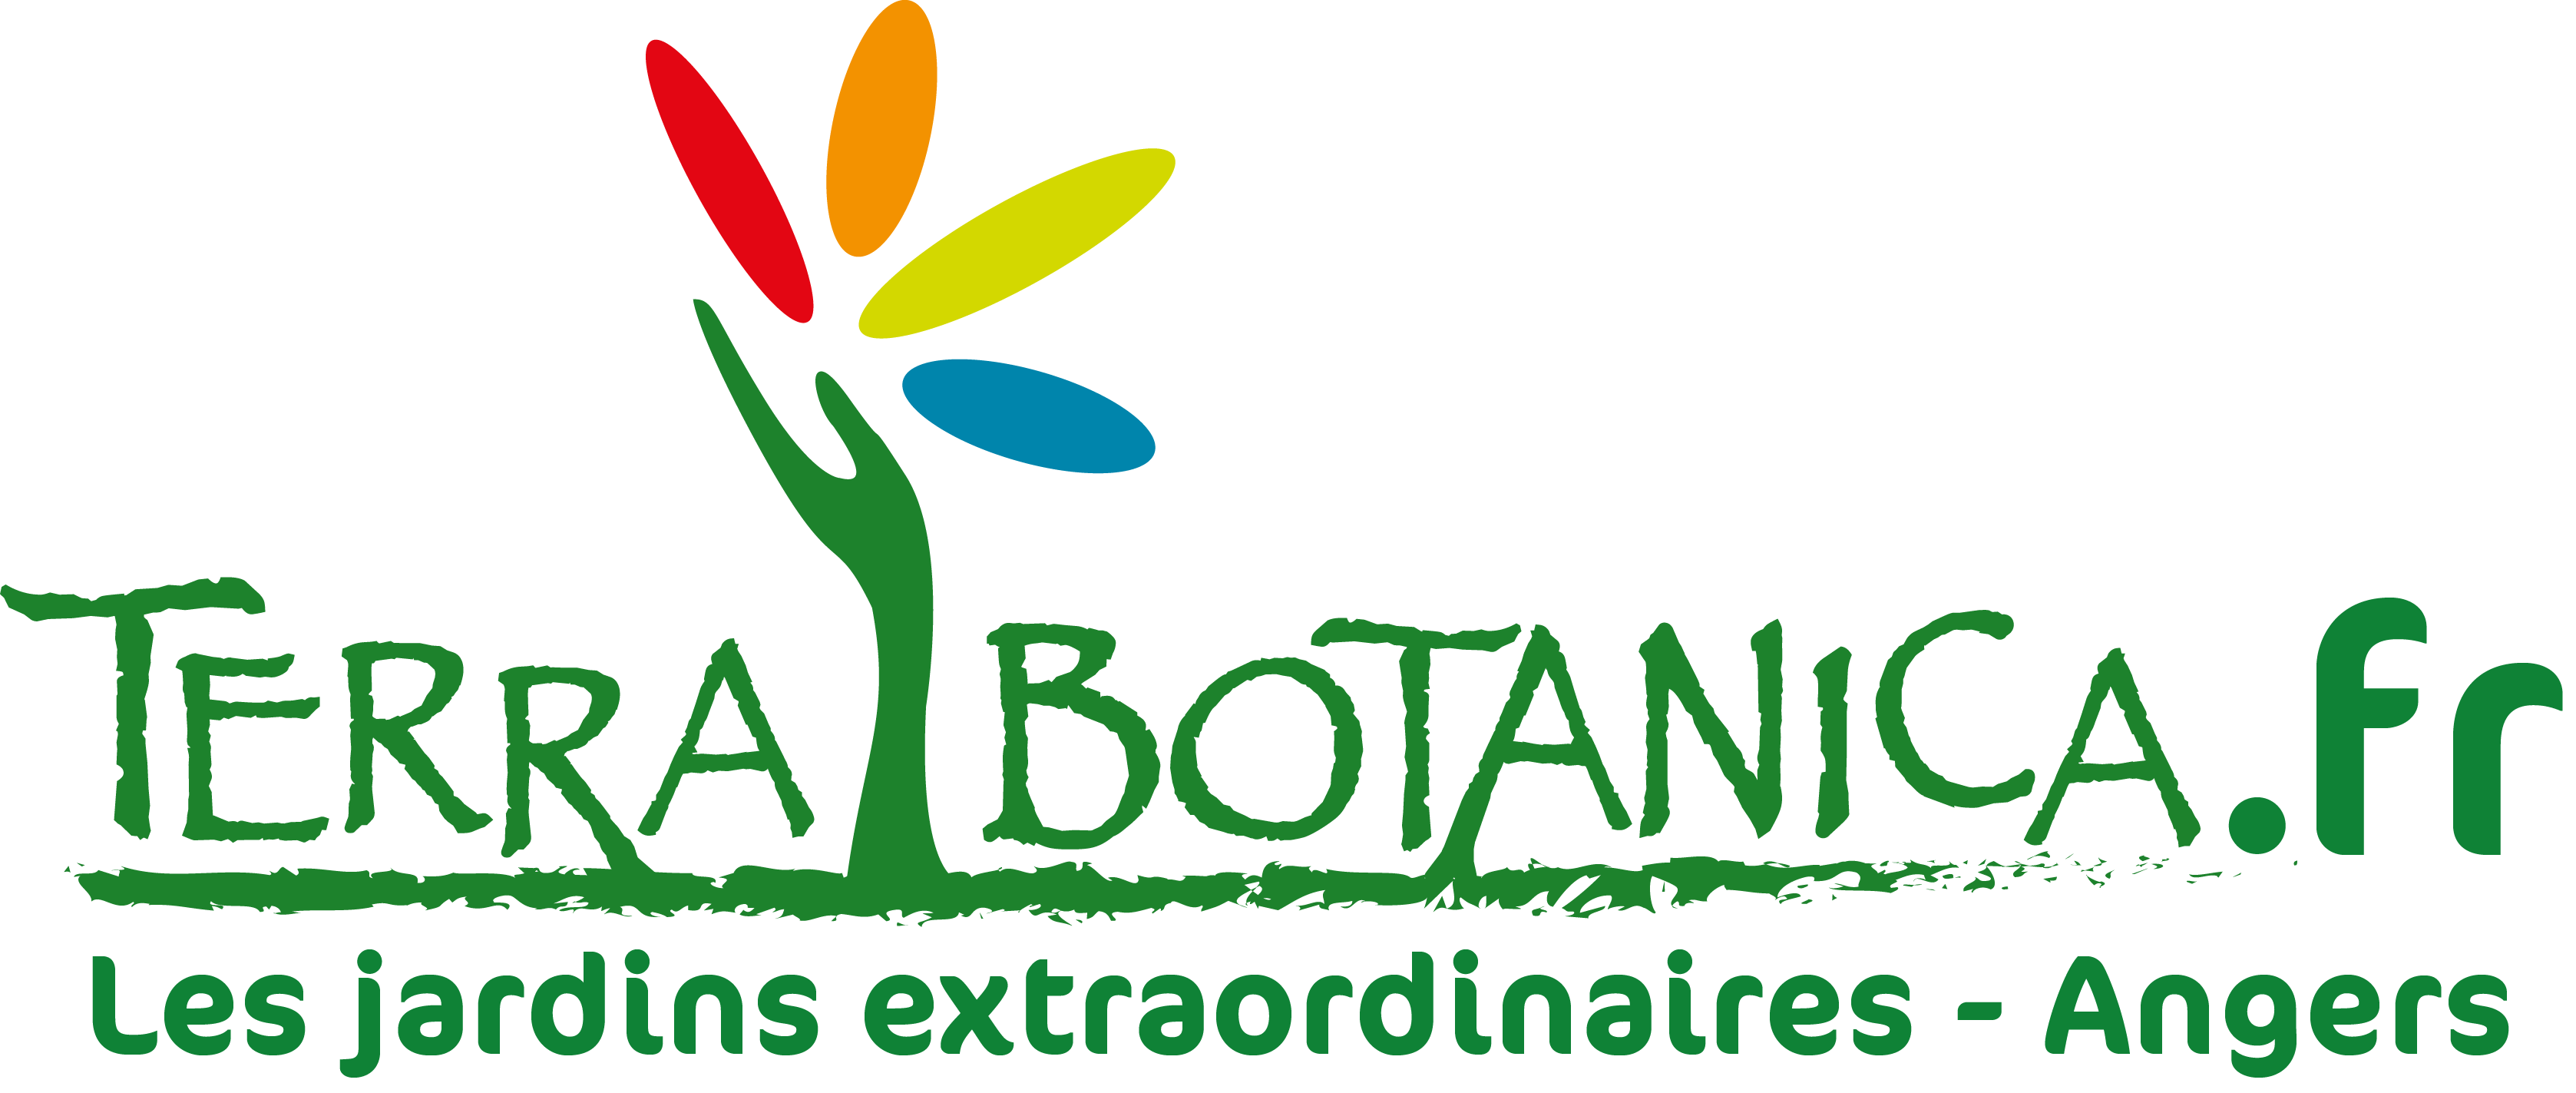 Terra_Botanica_beresford